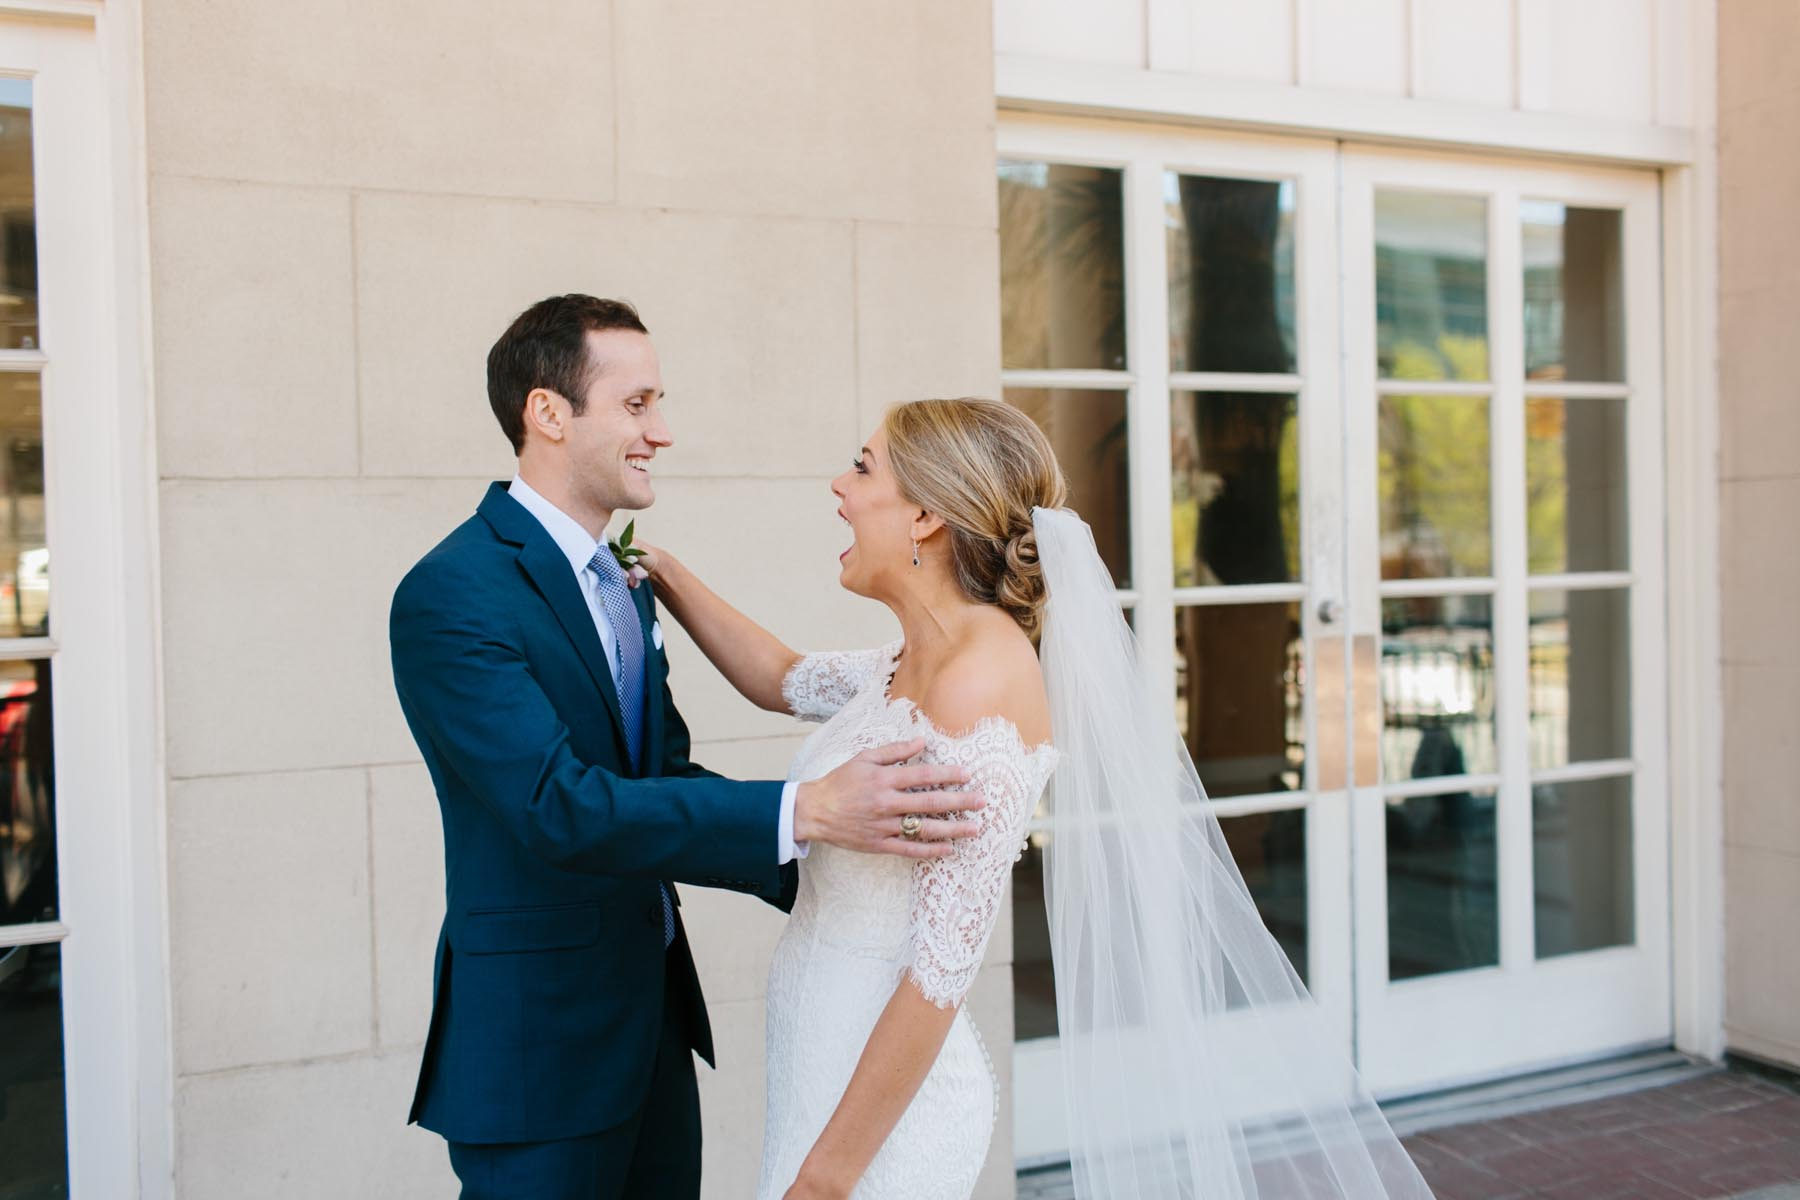 kjellman wedding blog biltmore wedding -31